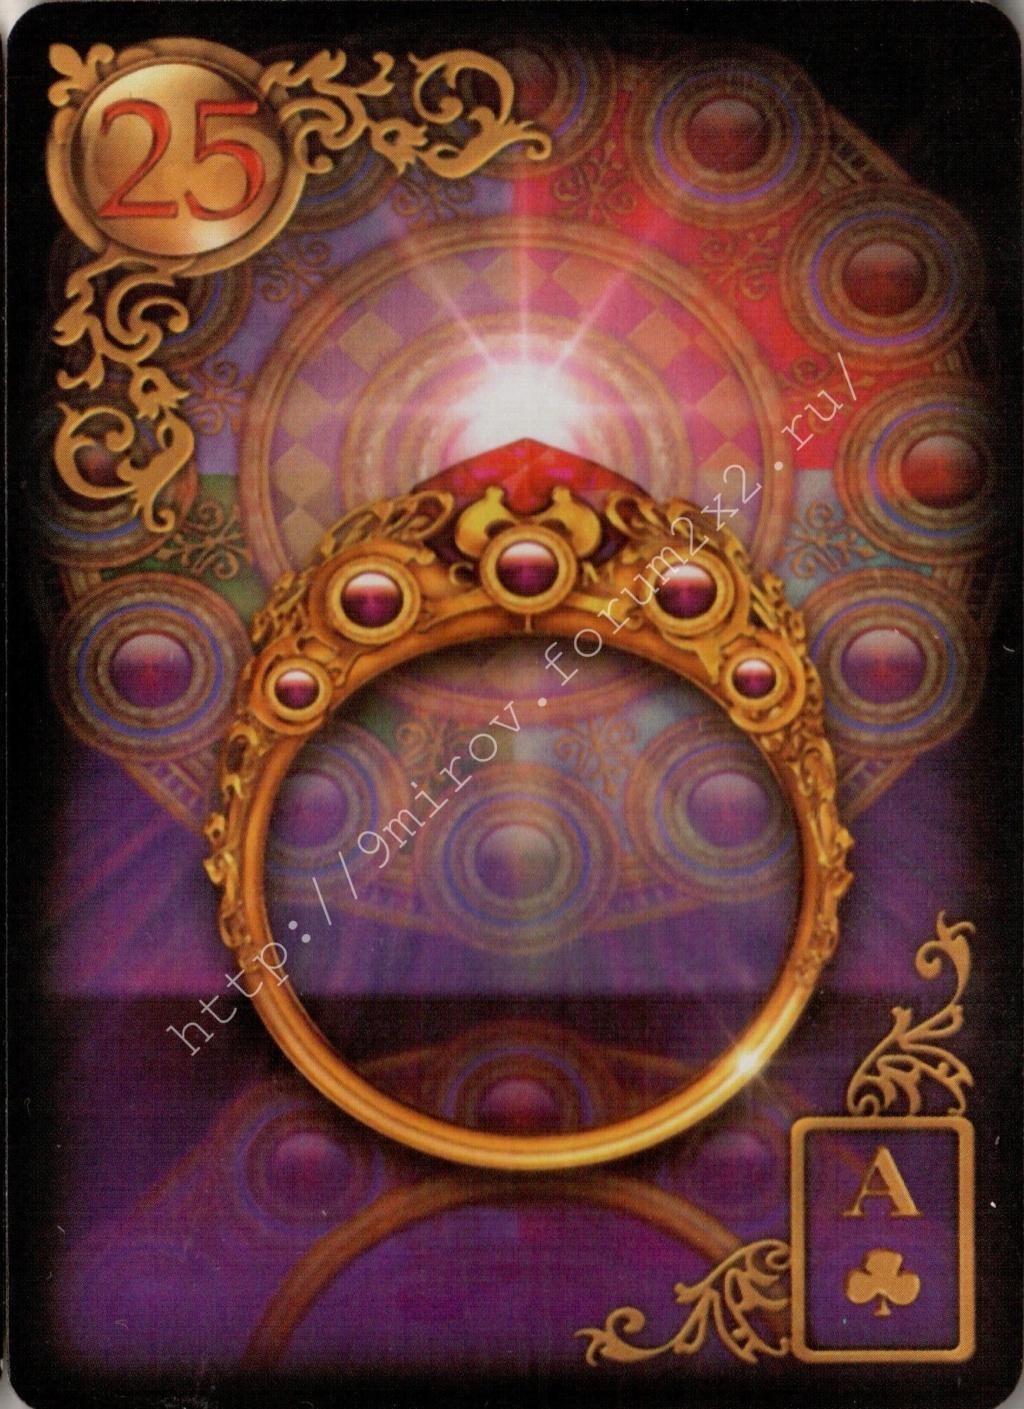 Золотые мечты Ленорман (Расширенное издание) | Gilded Reverie Lenormand. Галерея.  Water116